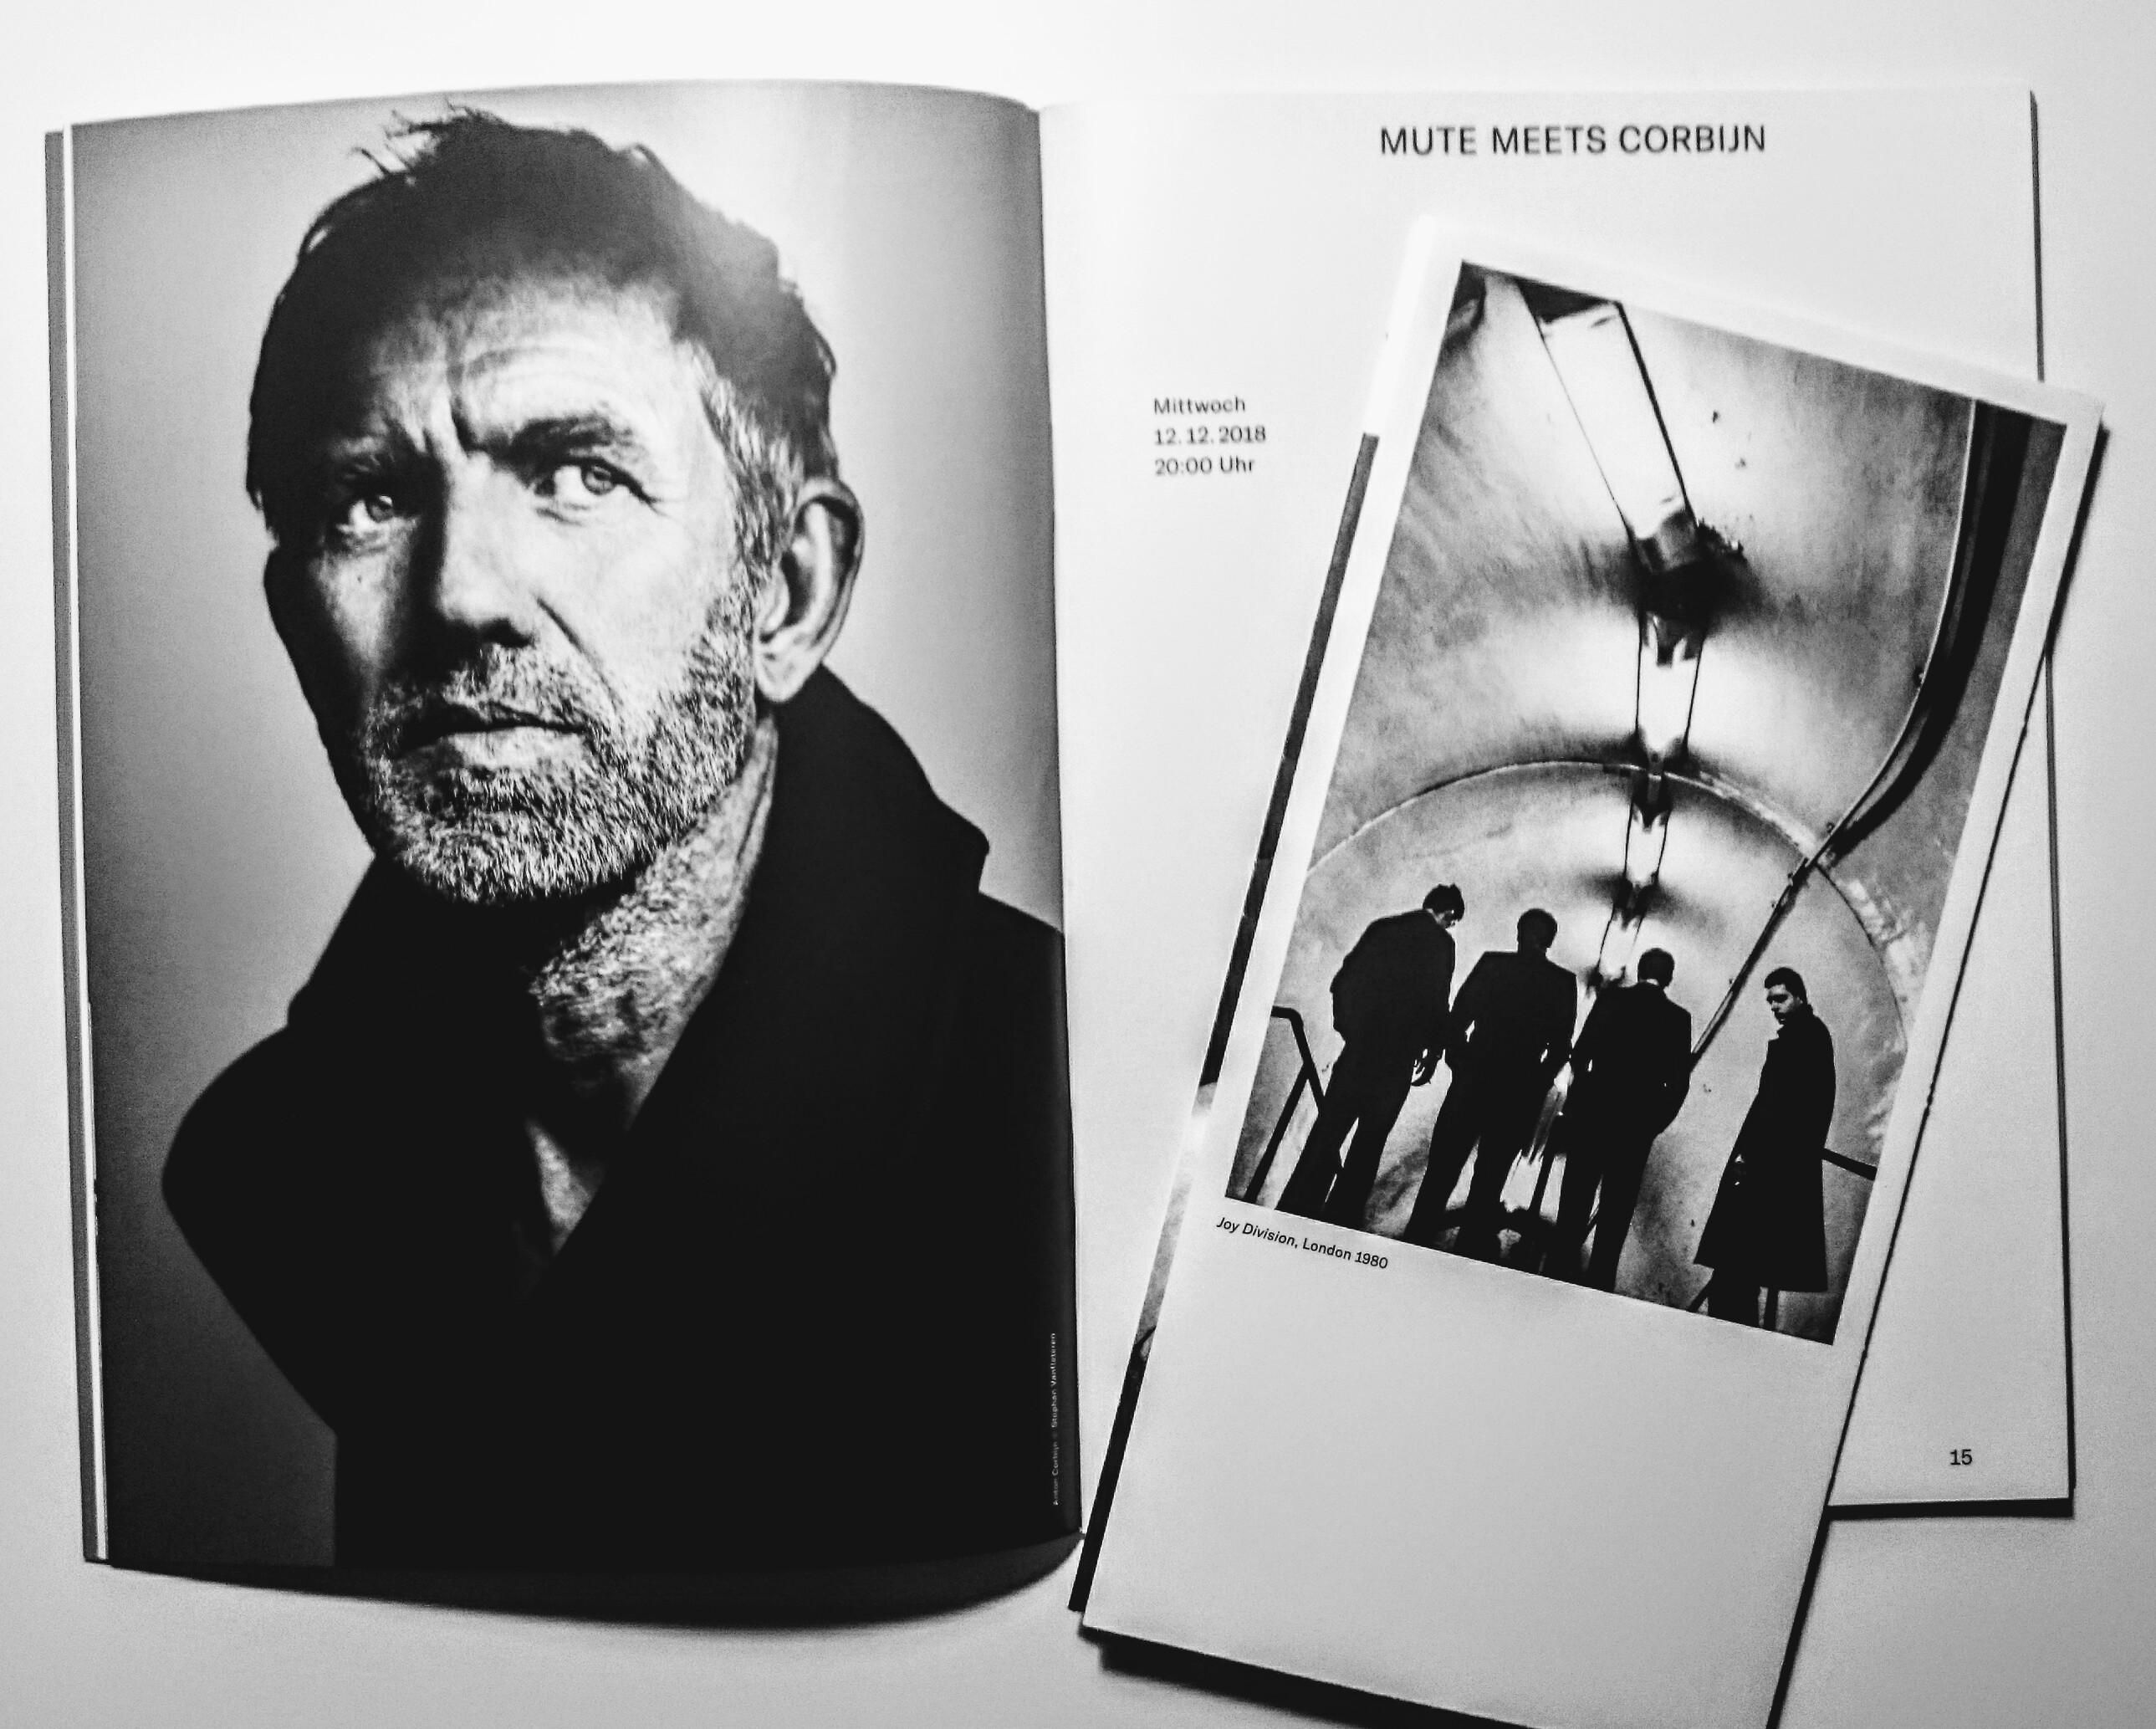 Exhibition, Photographie, Anton Corbijn, Bucerius Kunst Forum, Hamburg, Popmusic, Talk, Daniel Miller, Mute Records, Max Dax, Musicjournalist, Joy Division